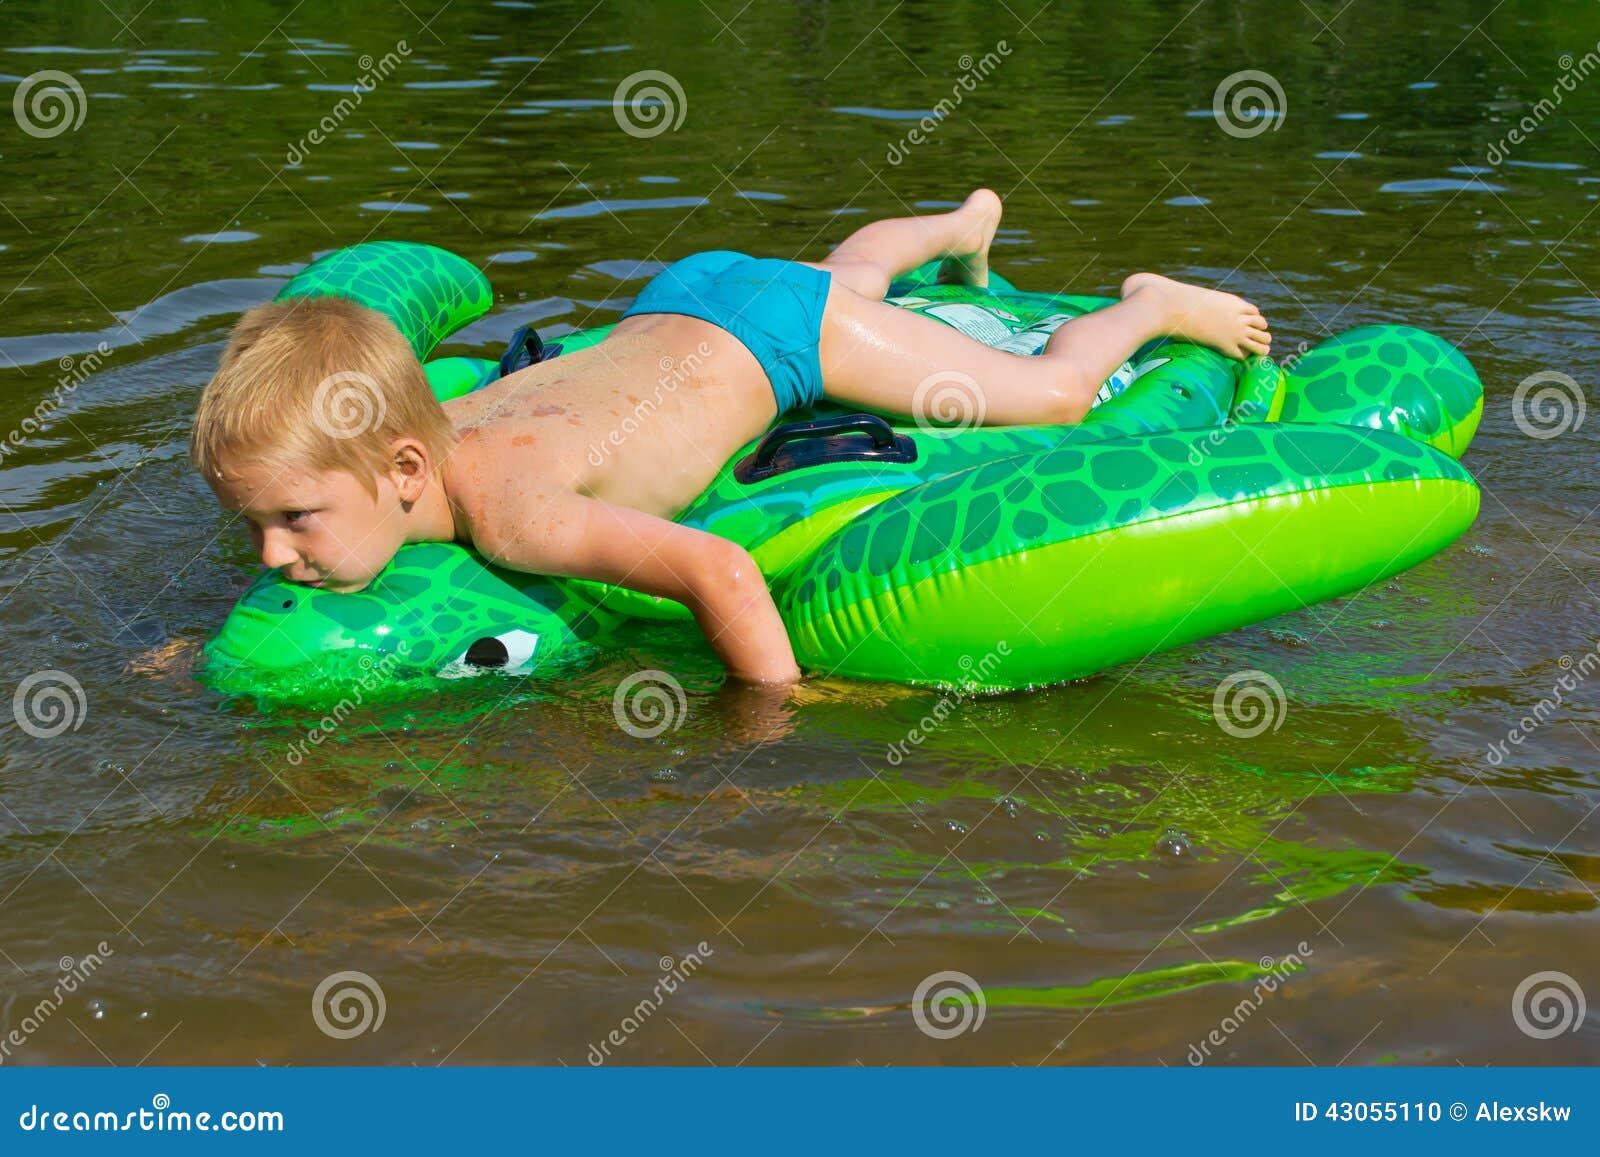 boy swimming river - photo #20